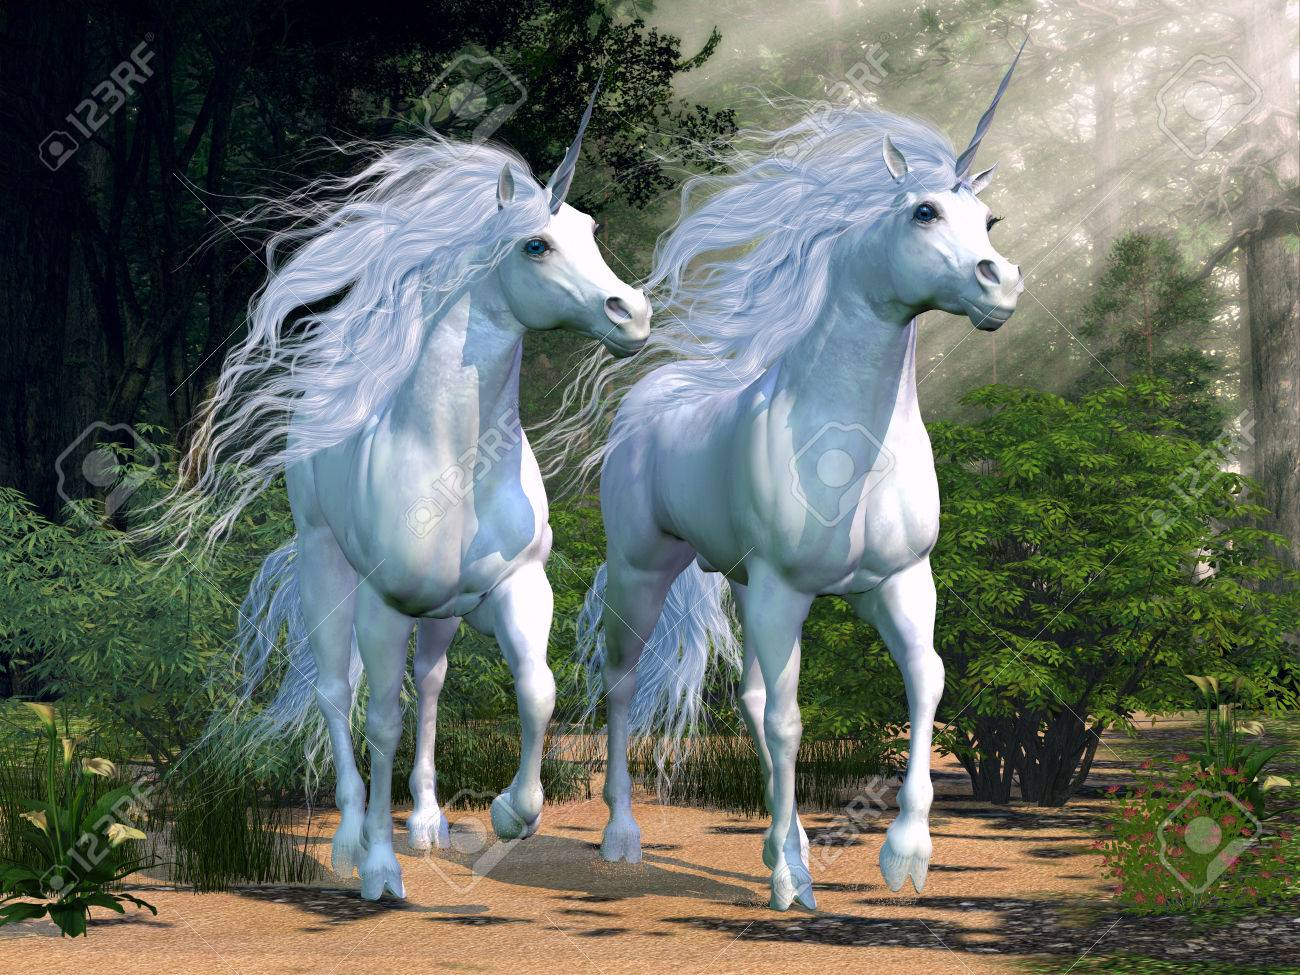 unicorn images u0026 stock pictures royalty free unicorn photos and